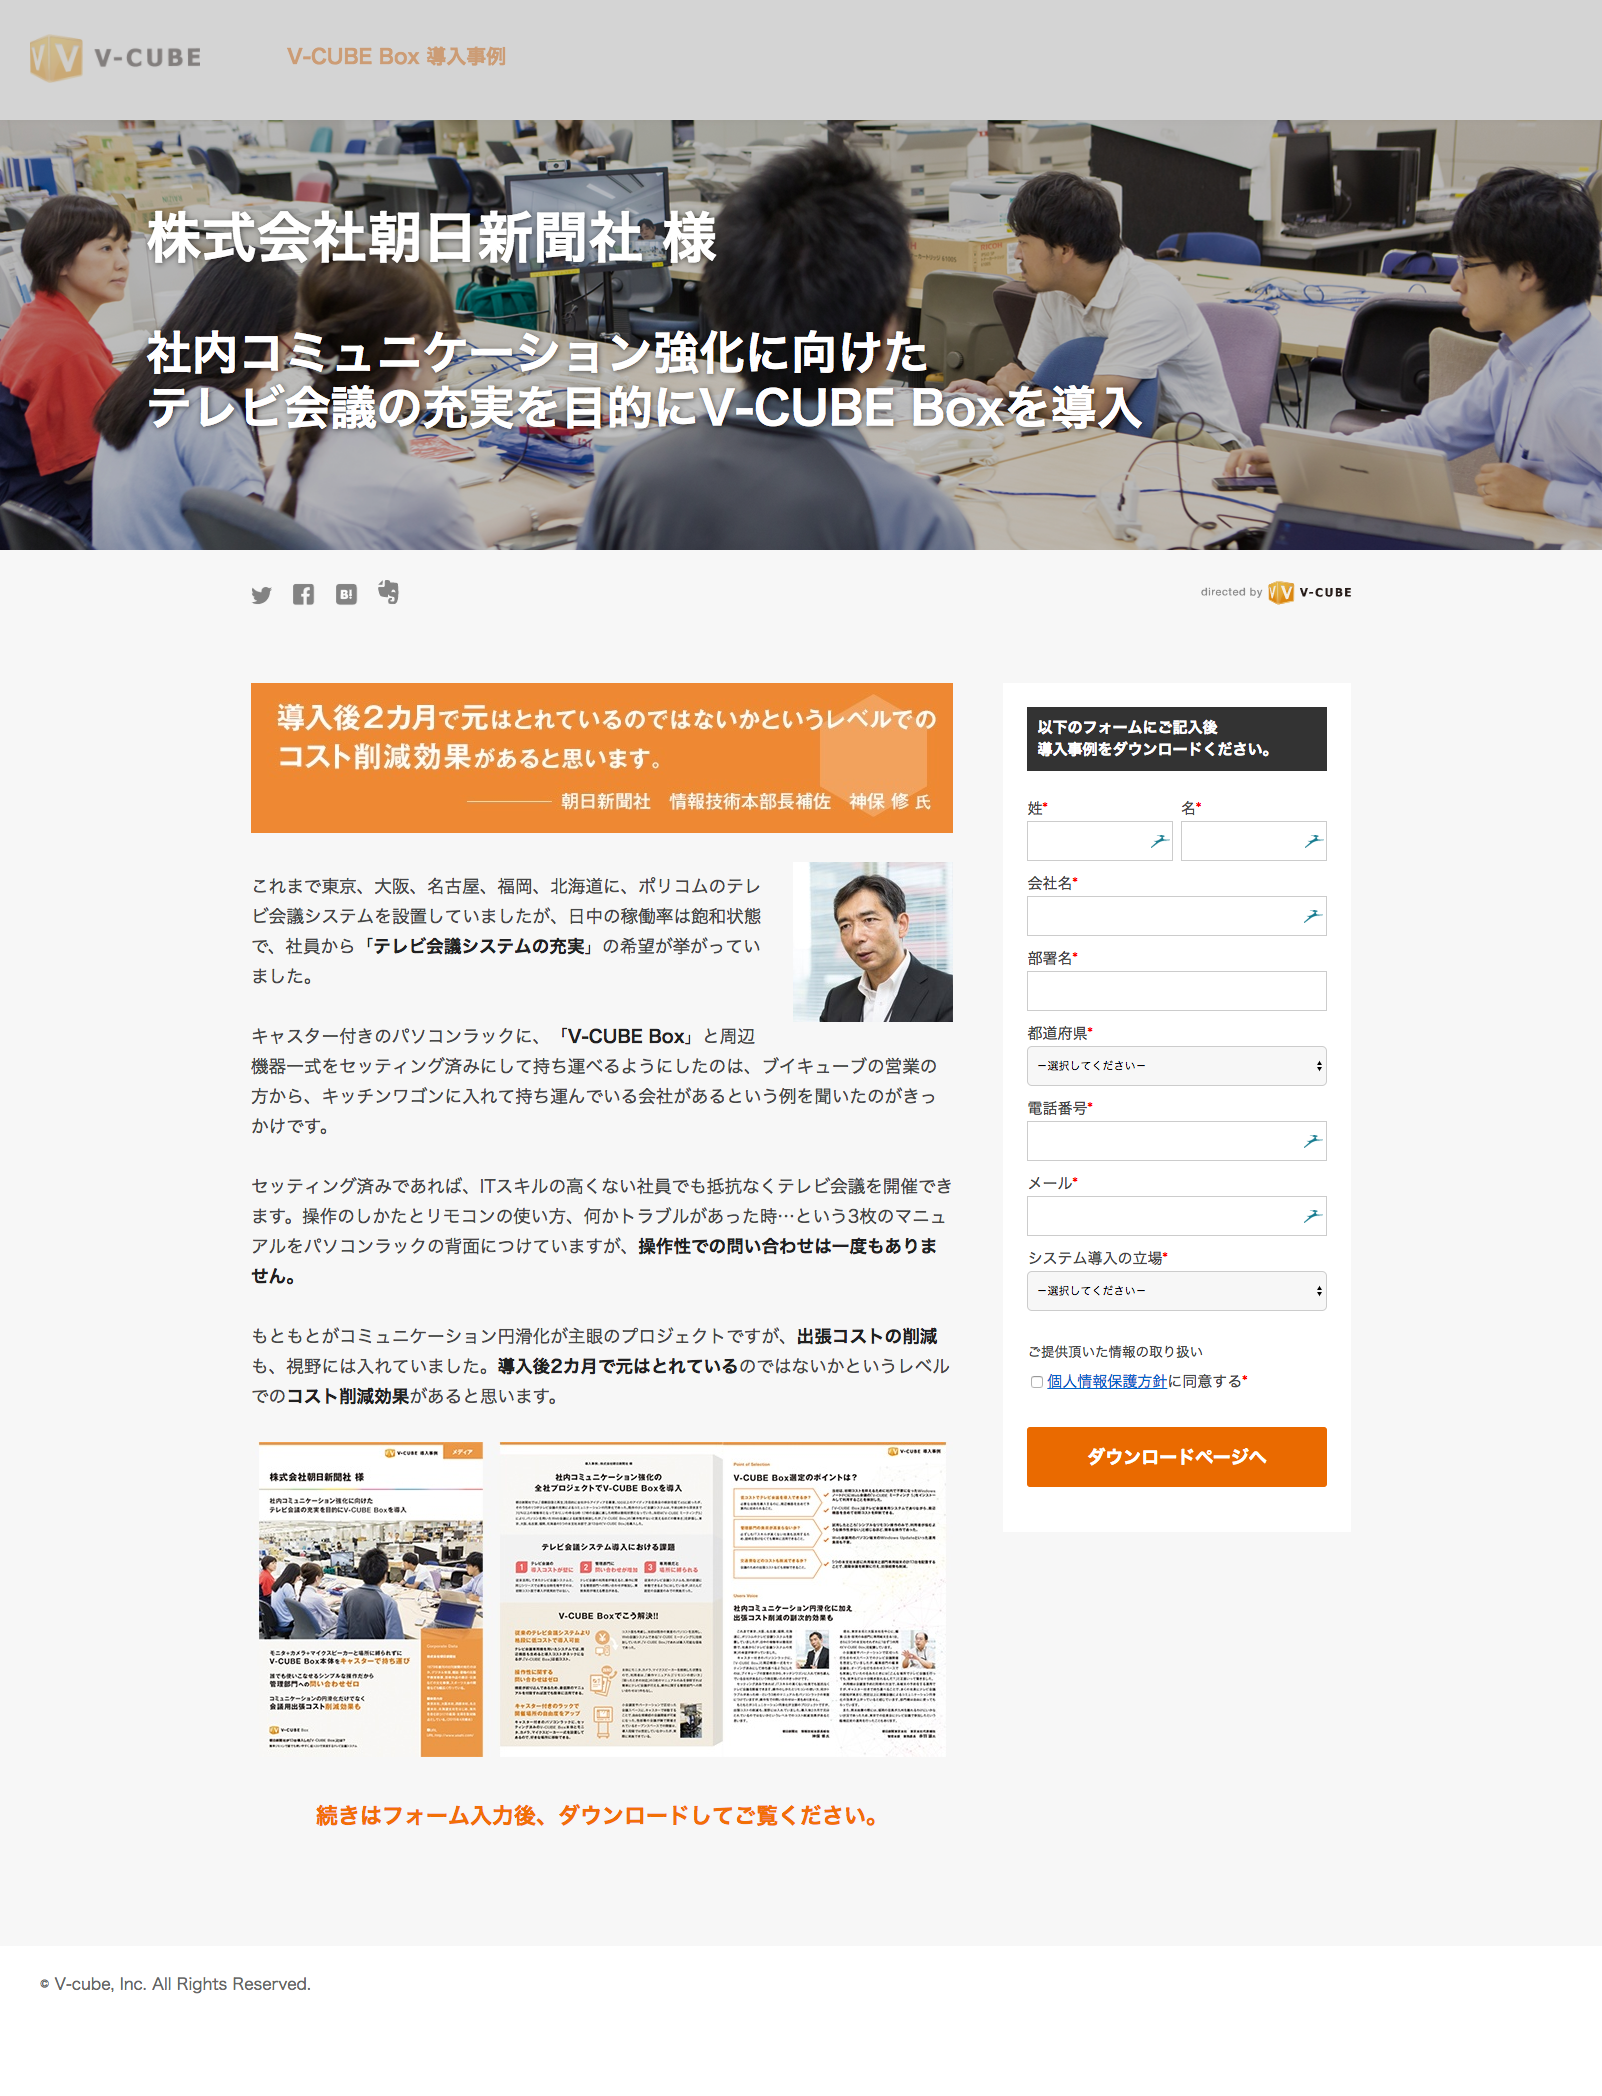 screenshot-lp.vcube.com-2017-04-21-17-50-56.png